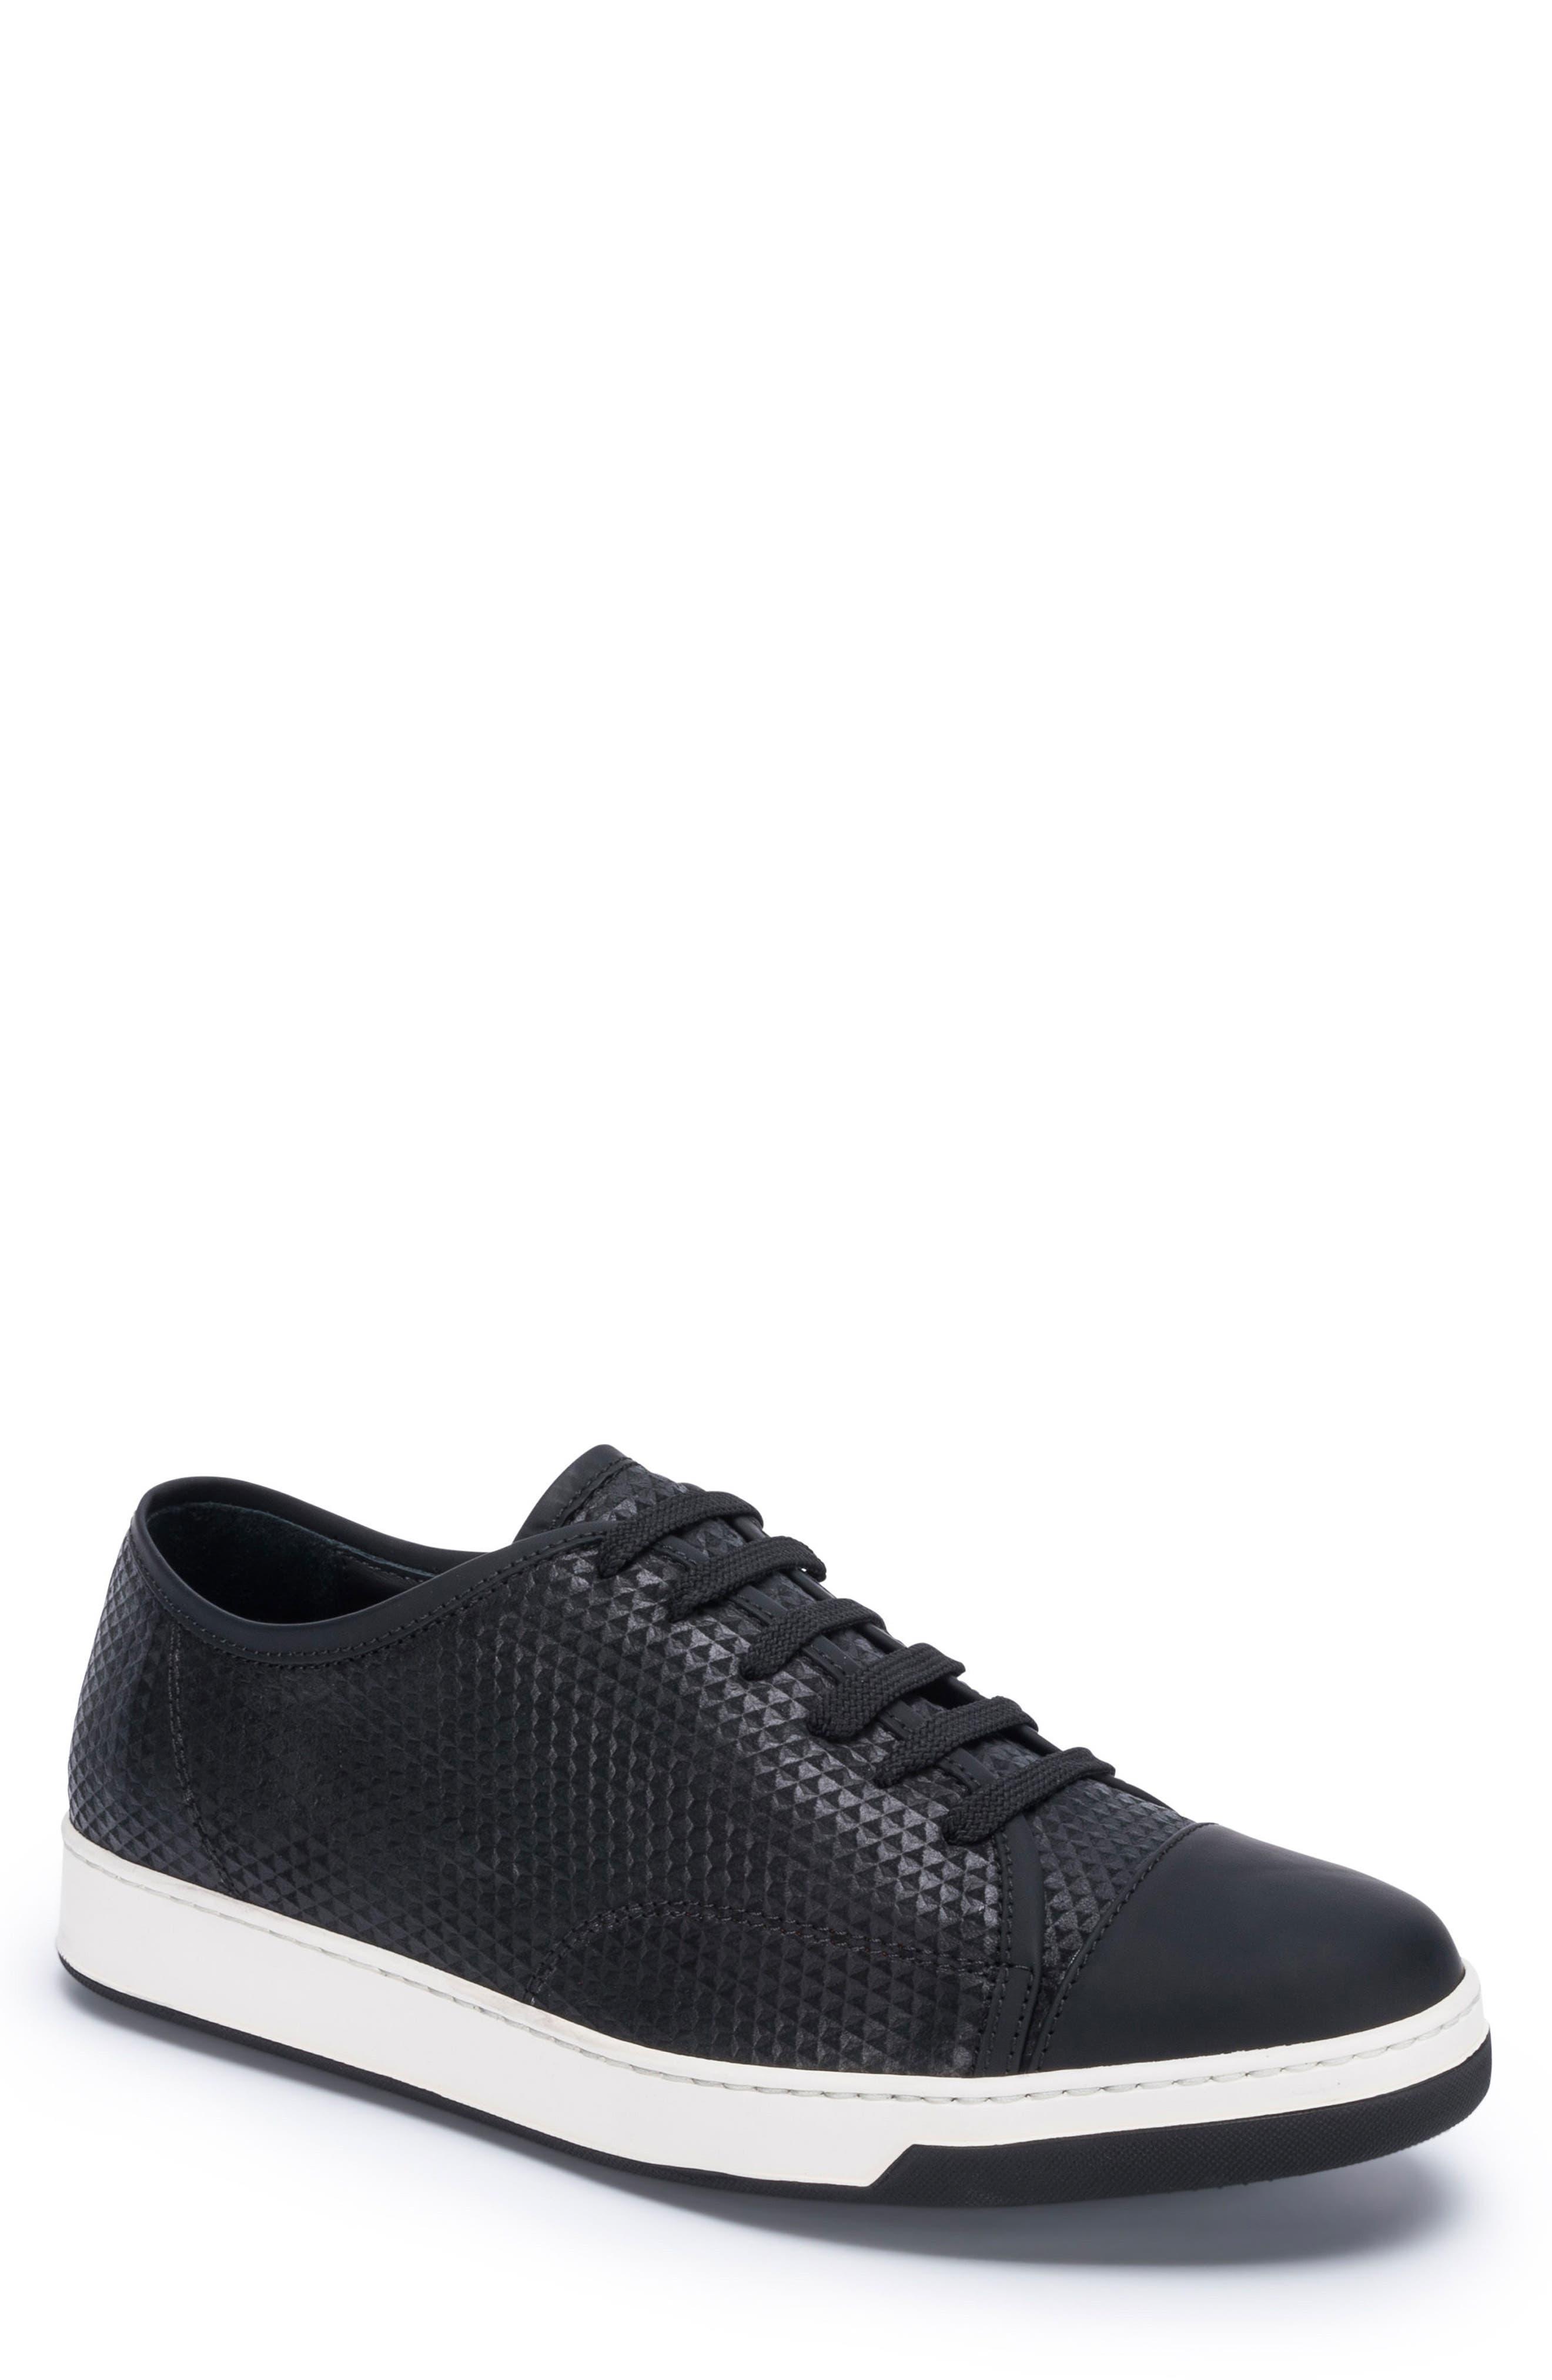 Ischia Sneaker,                             Main thumbnail 1, color,                             Black